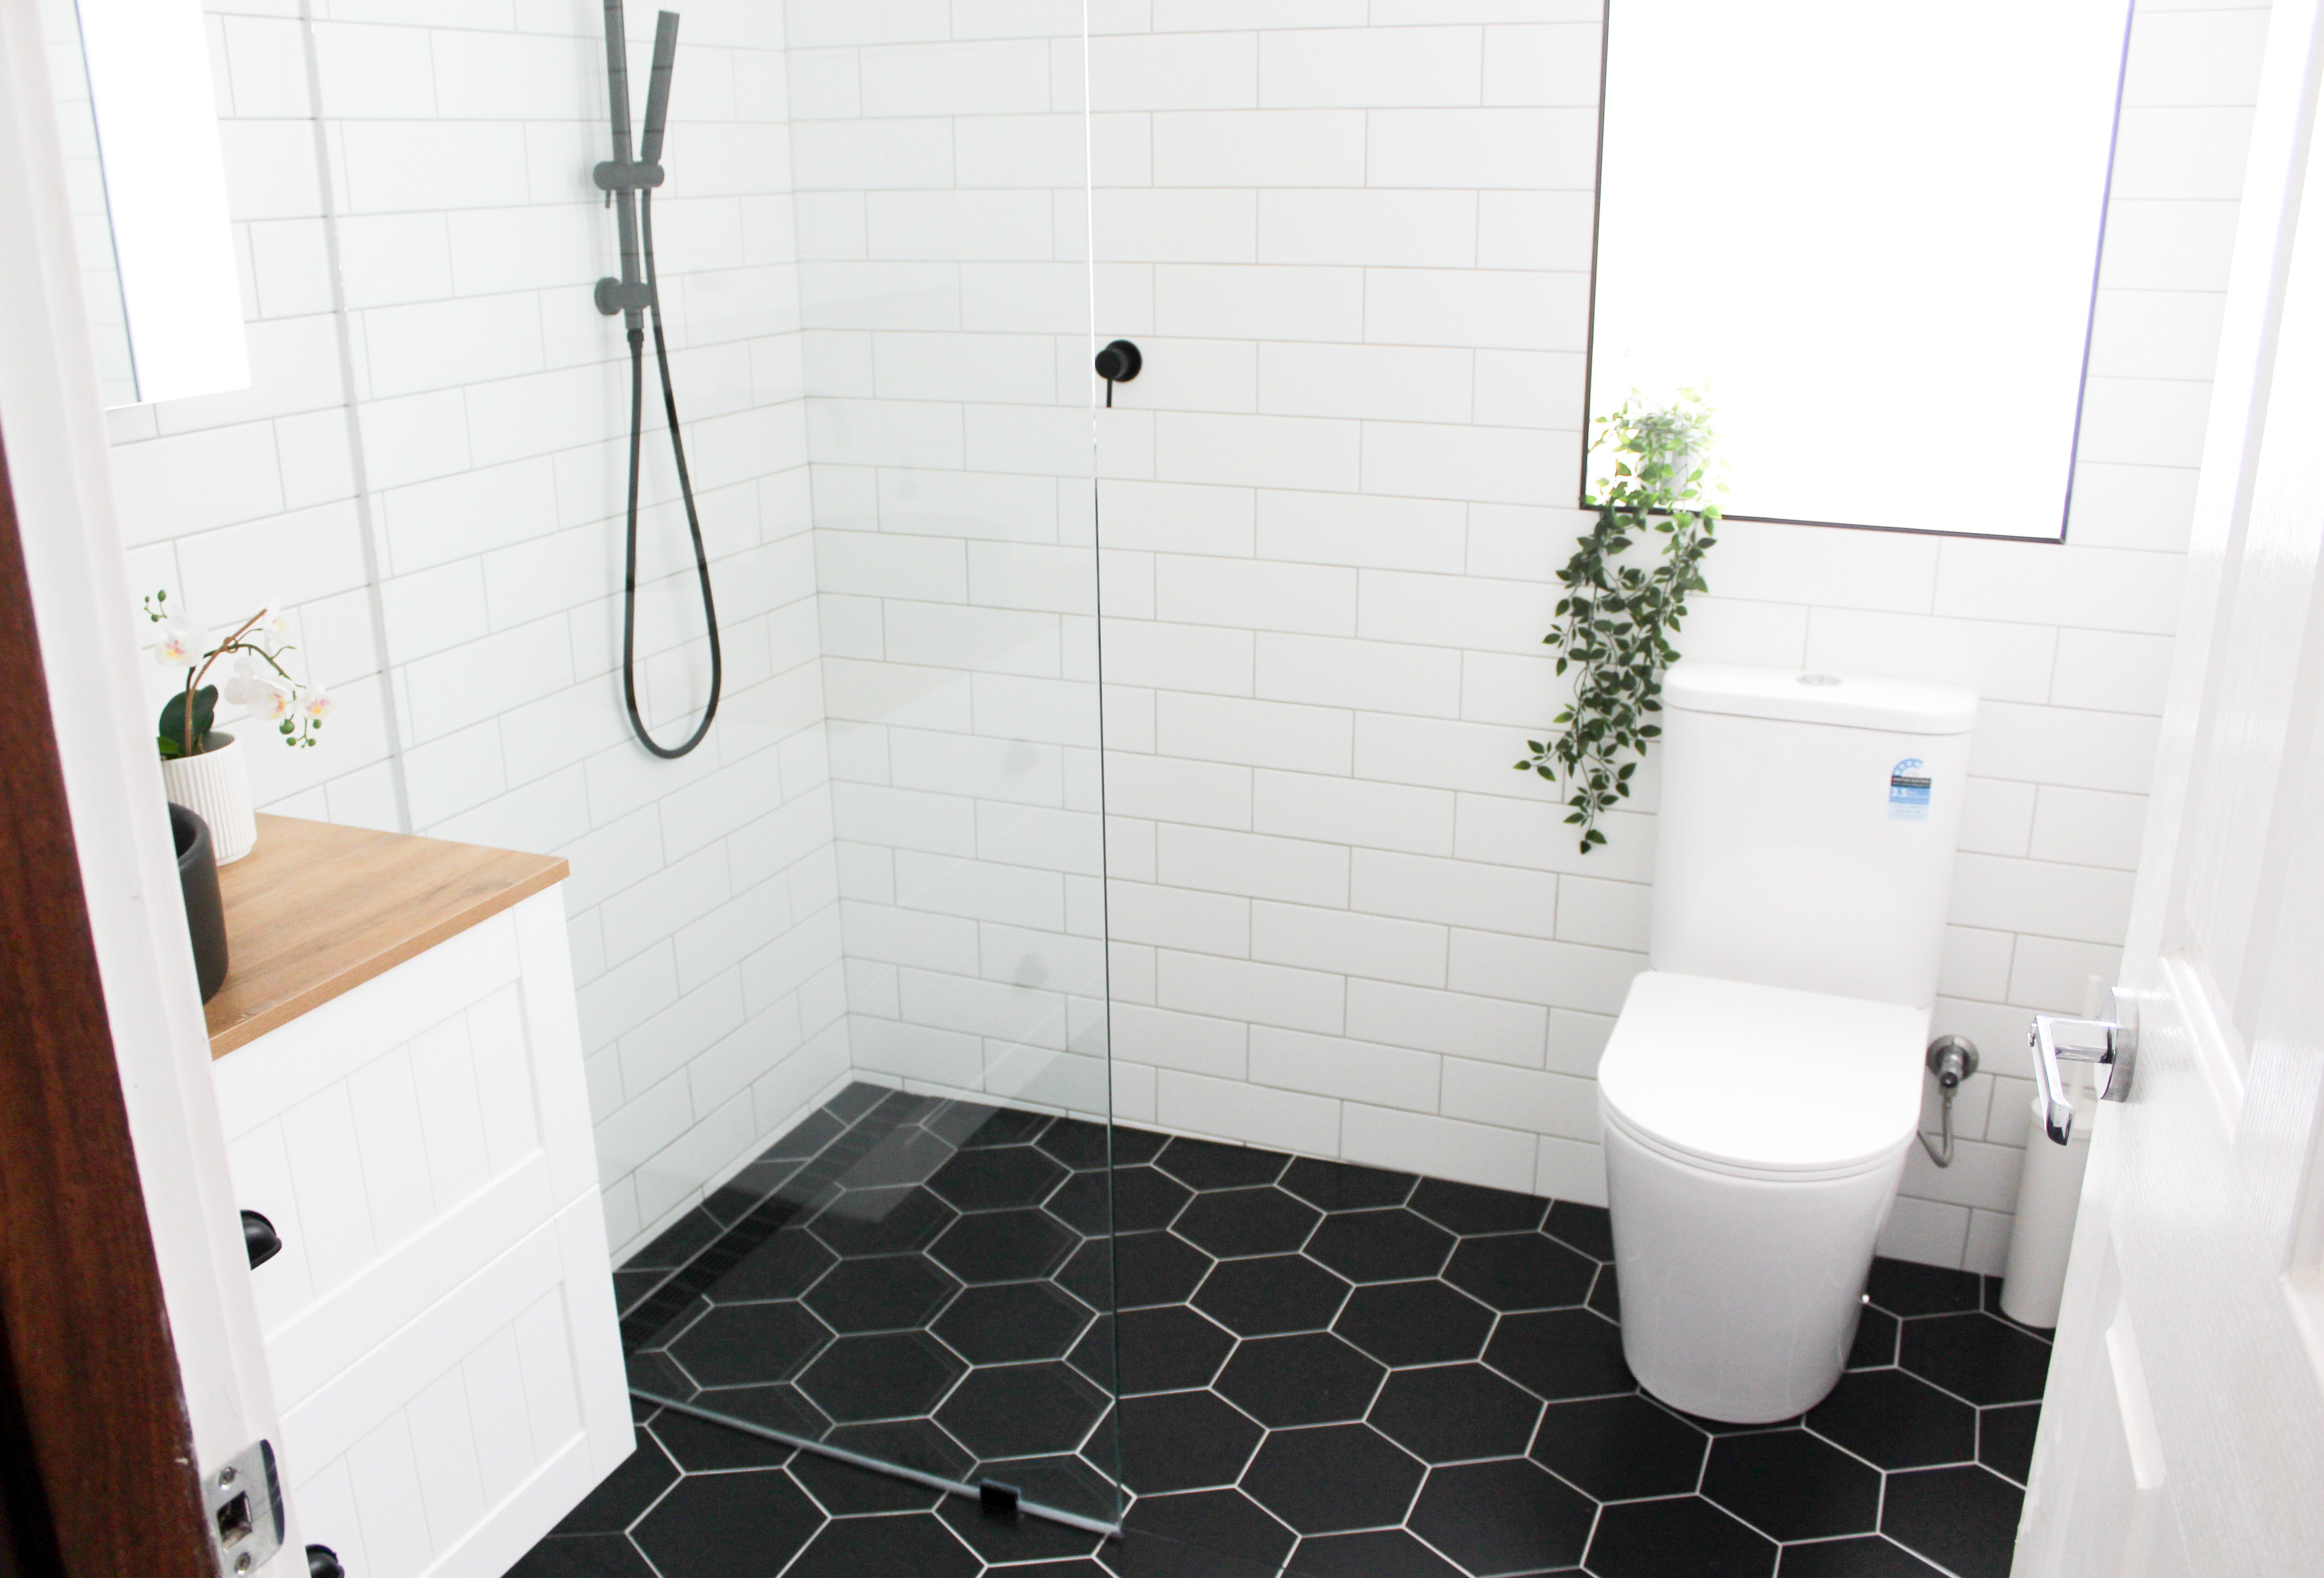 Subway Bathroom In 2020 Beautiful Bathroom Renovations Small Bathroom Renovations Bathroom Renovation Trends